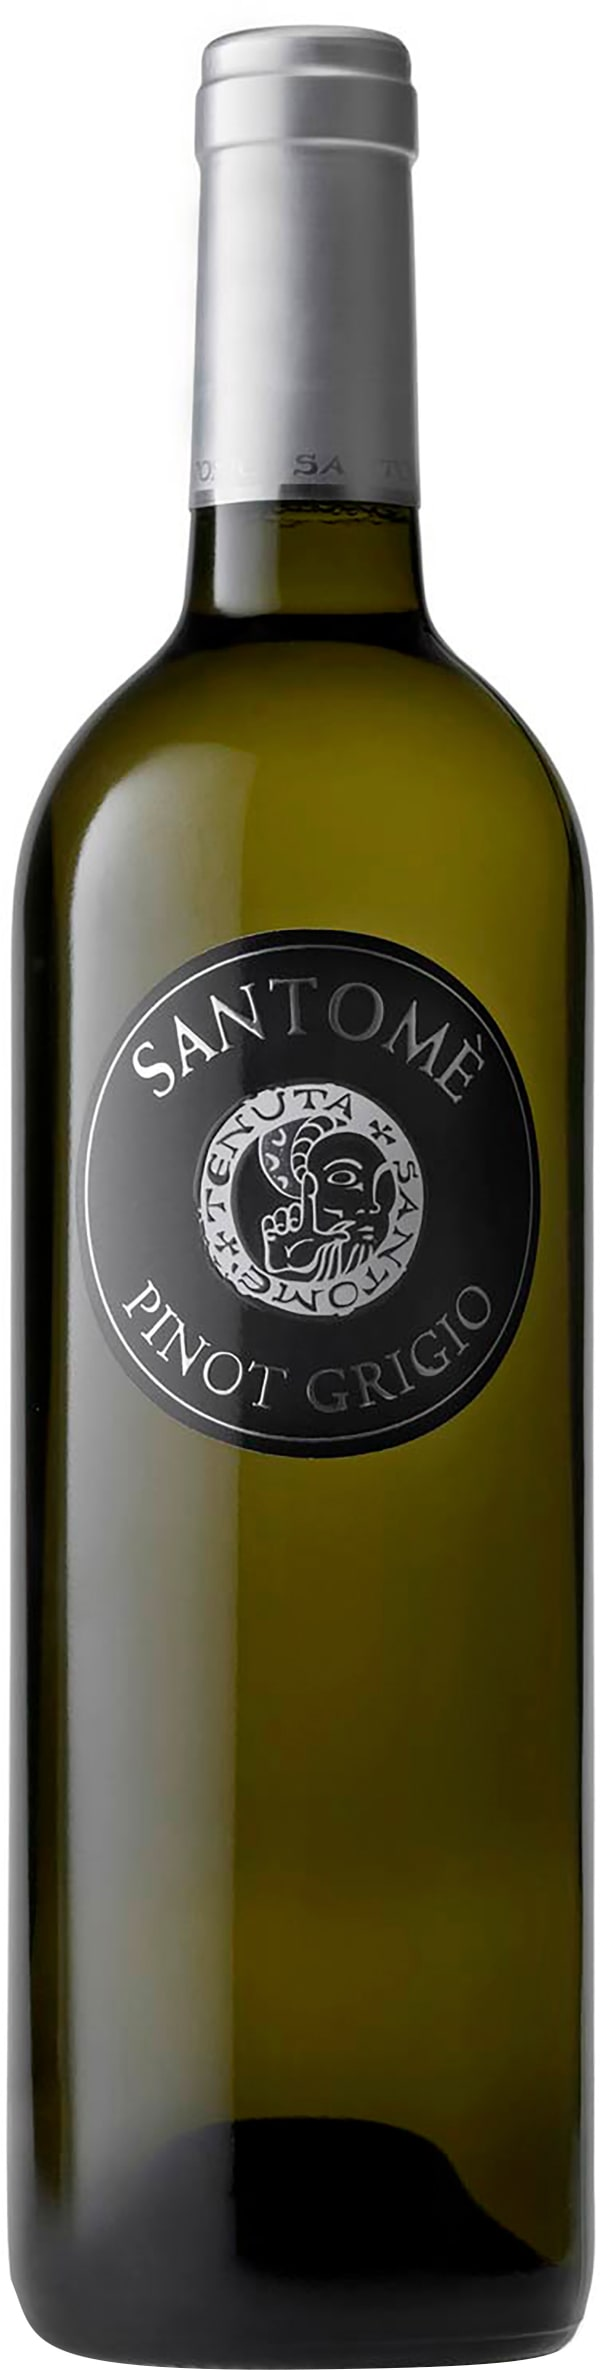 Santomè Pinot Grigio 2019